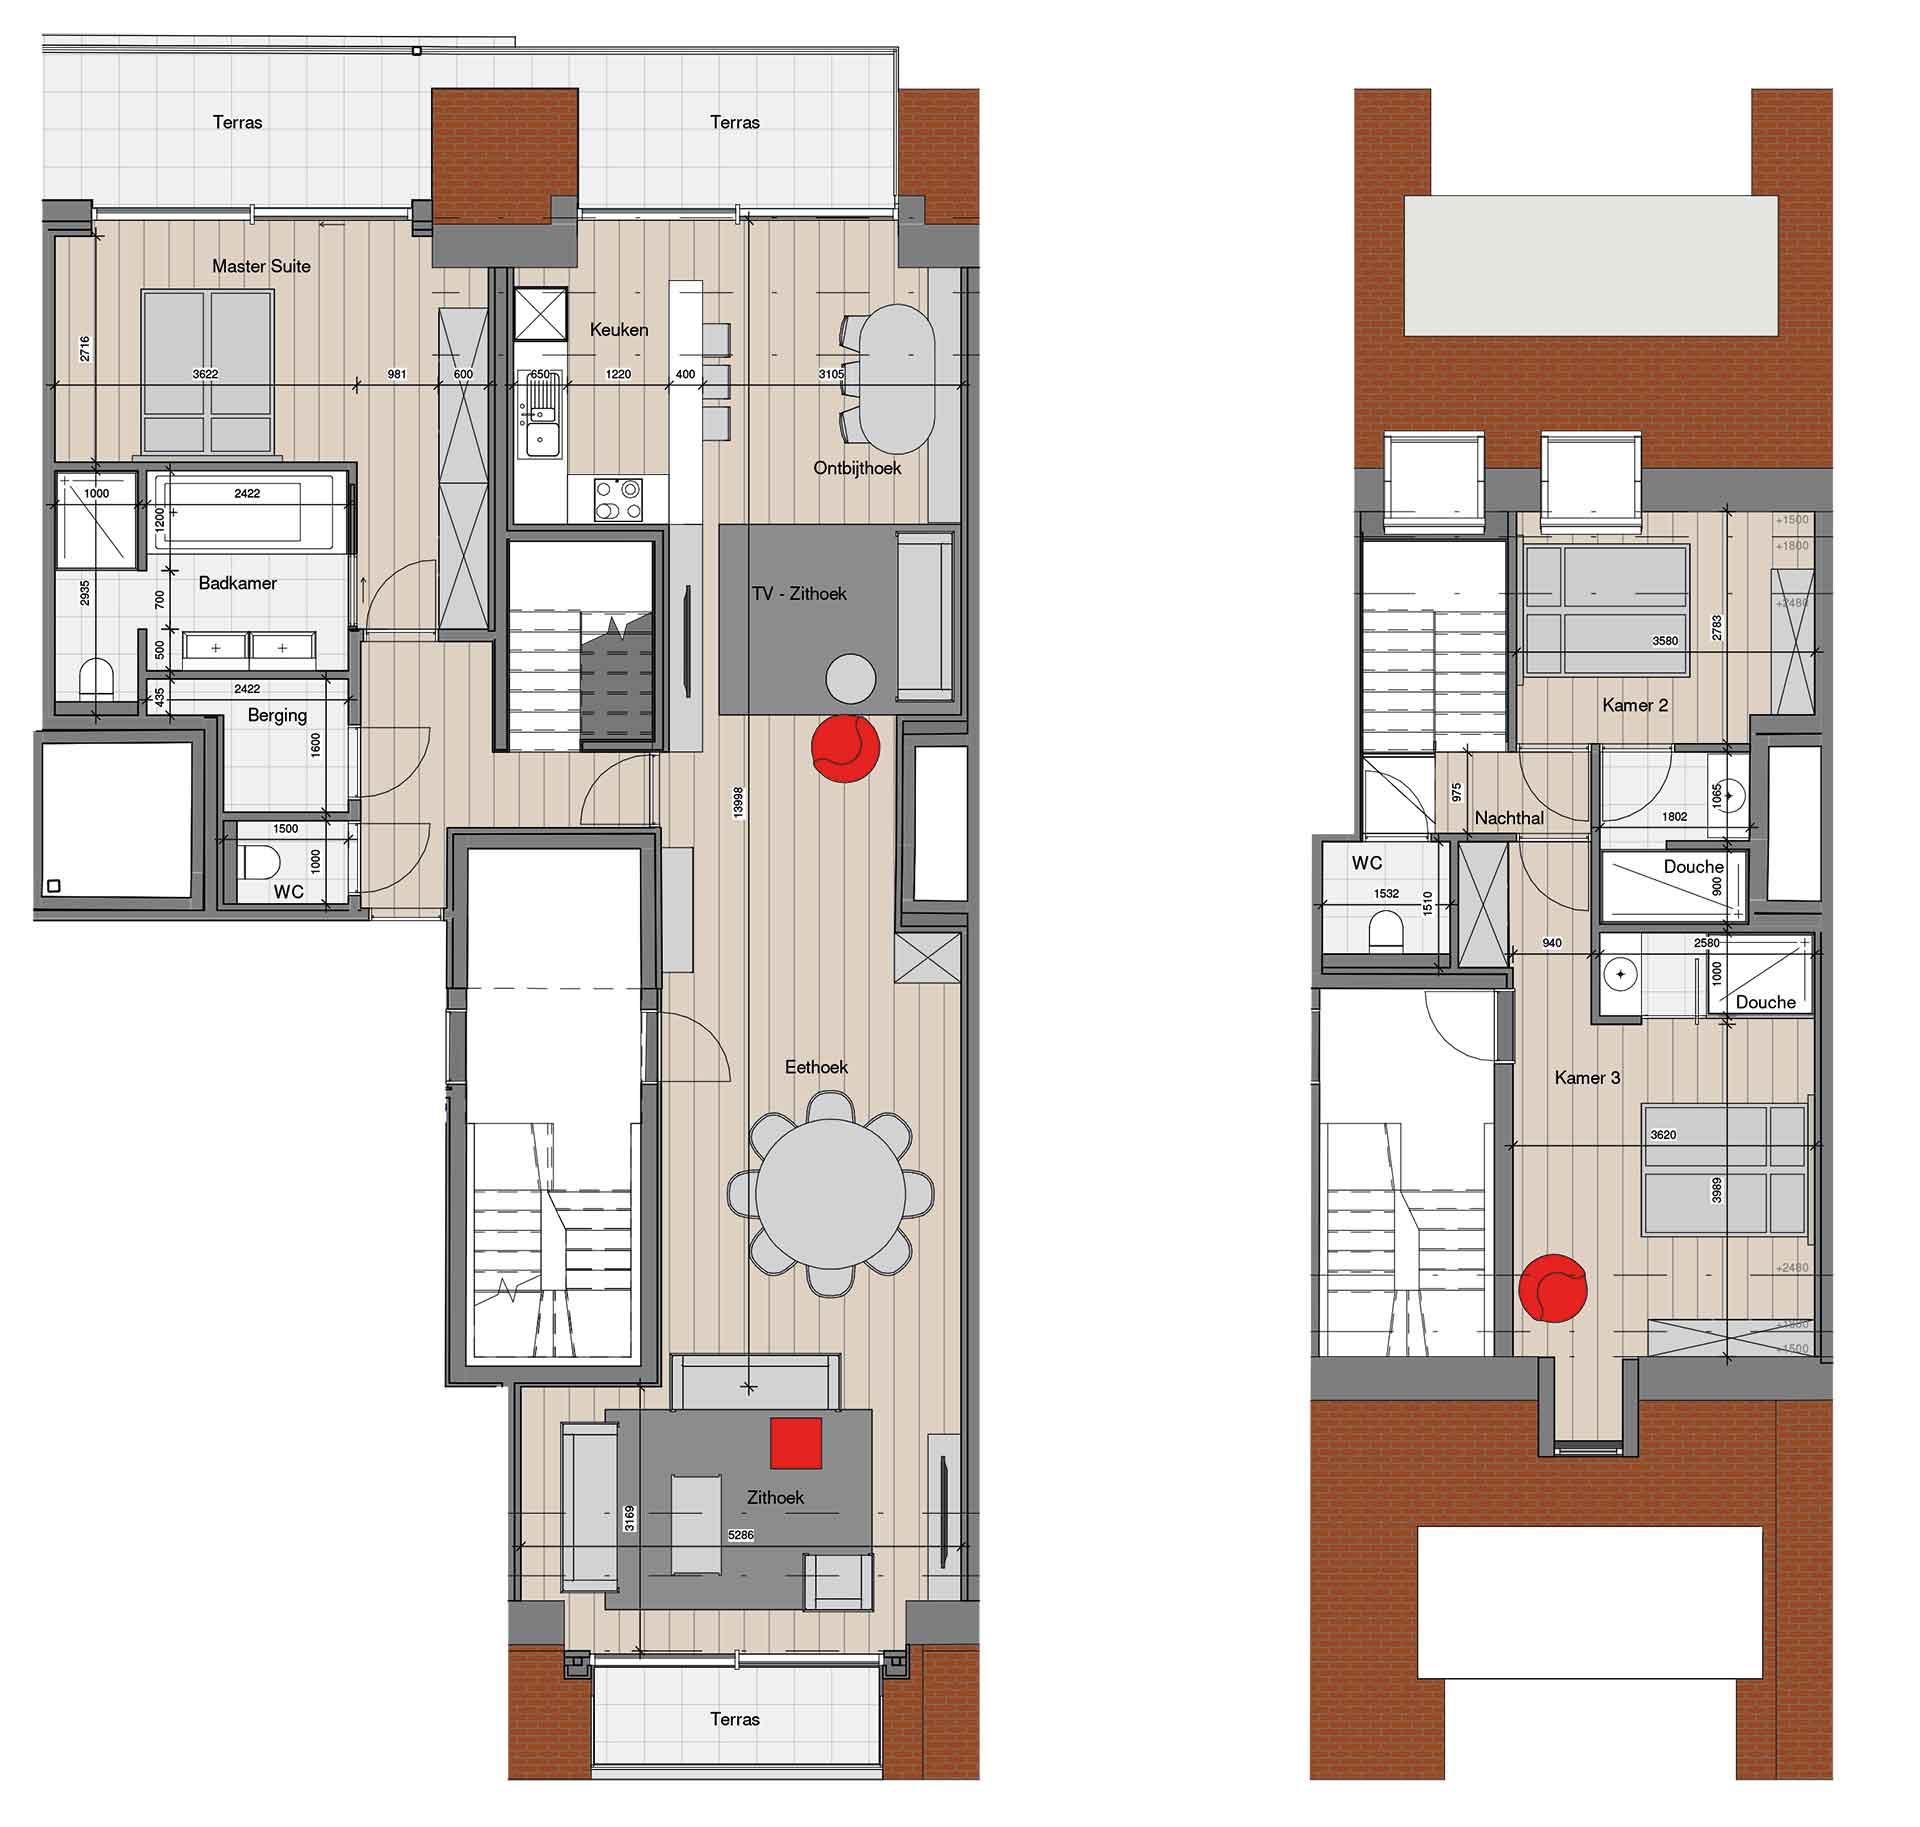 Residentie <br/> Louise - image residentie-louise-appartement-te-koop-knokke-plannen-50582 on https://hoprom.be